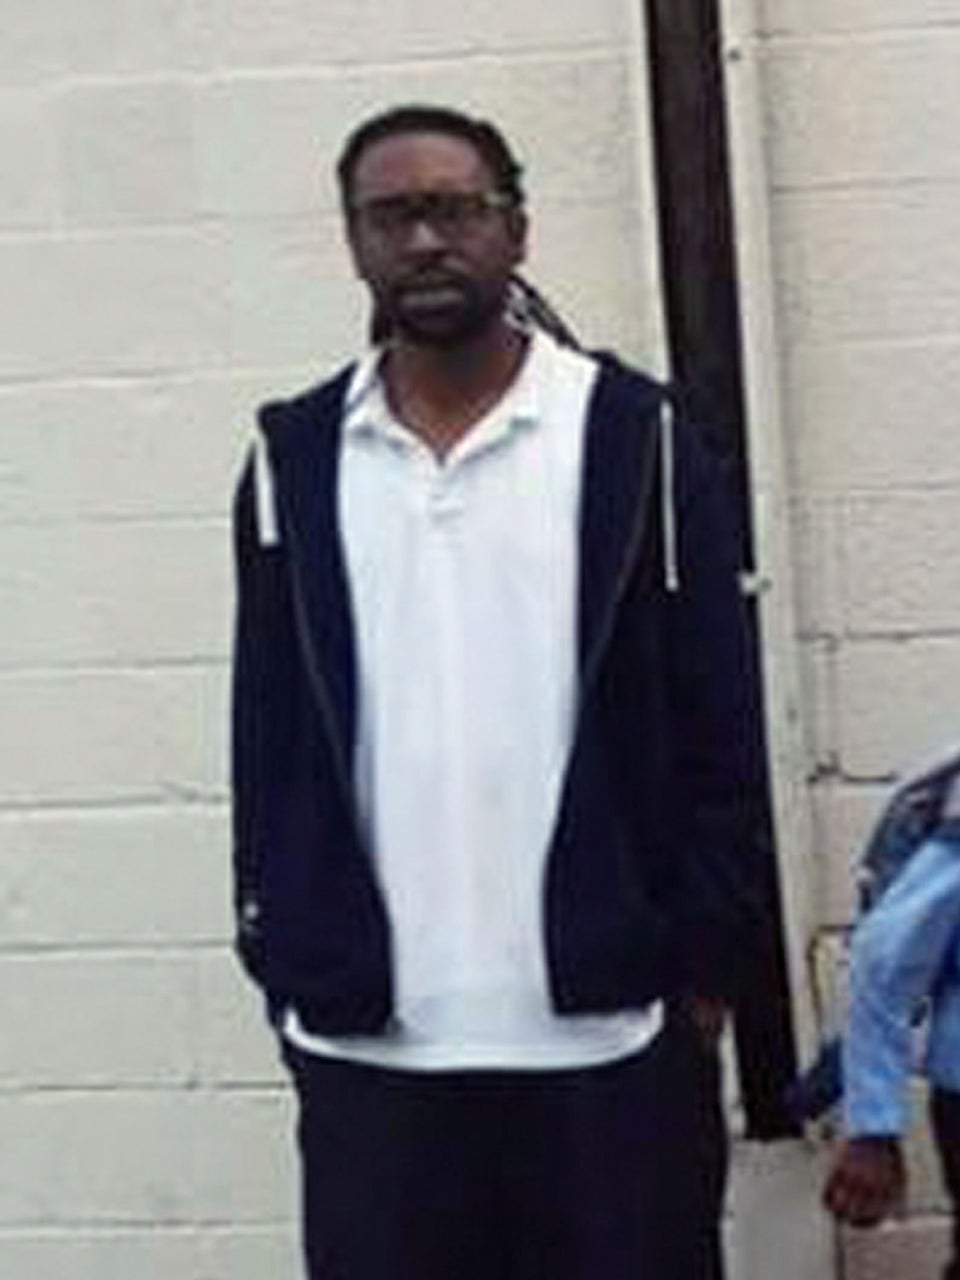 Philando Castile Death Ruled a Homicide, Officer Identified